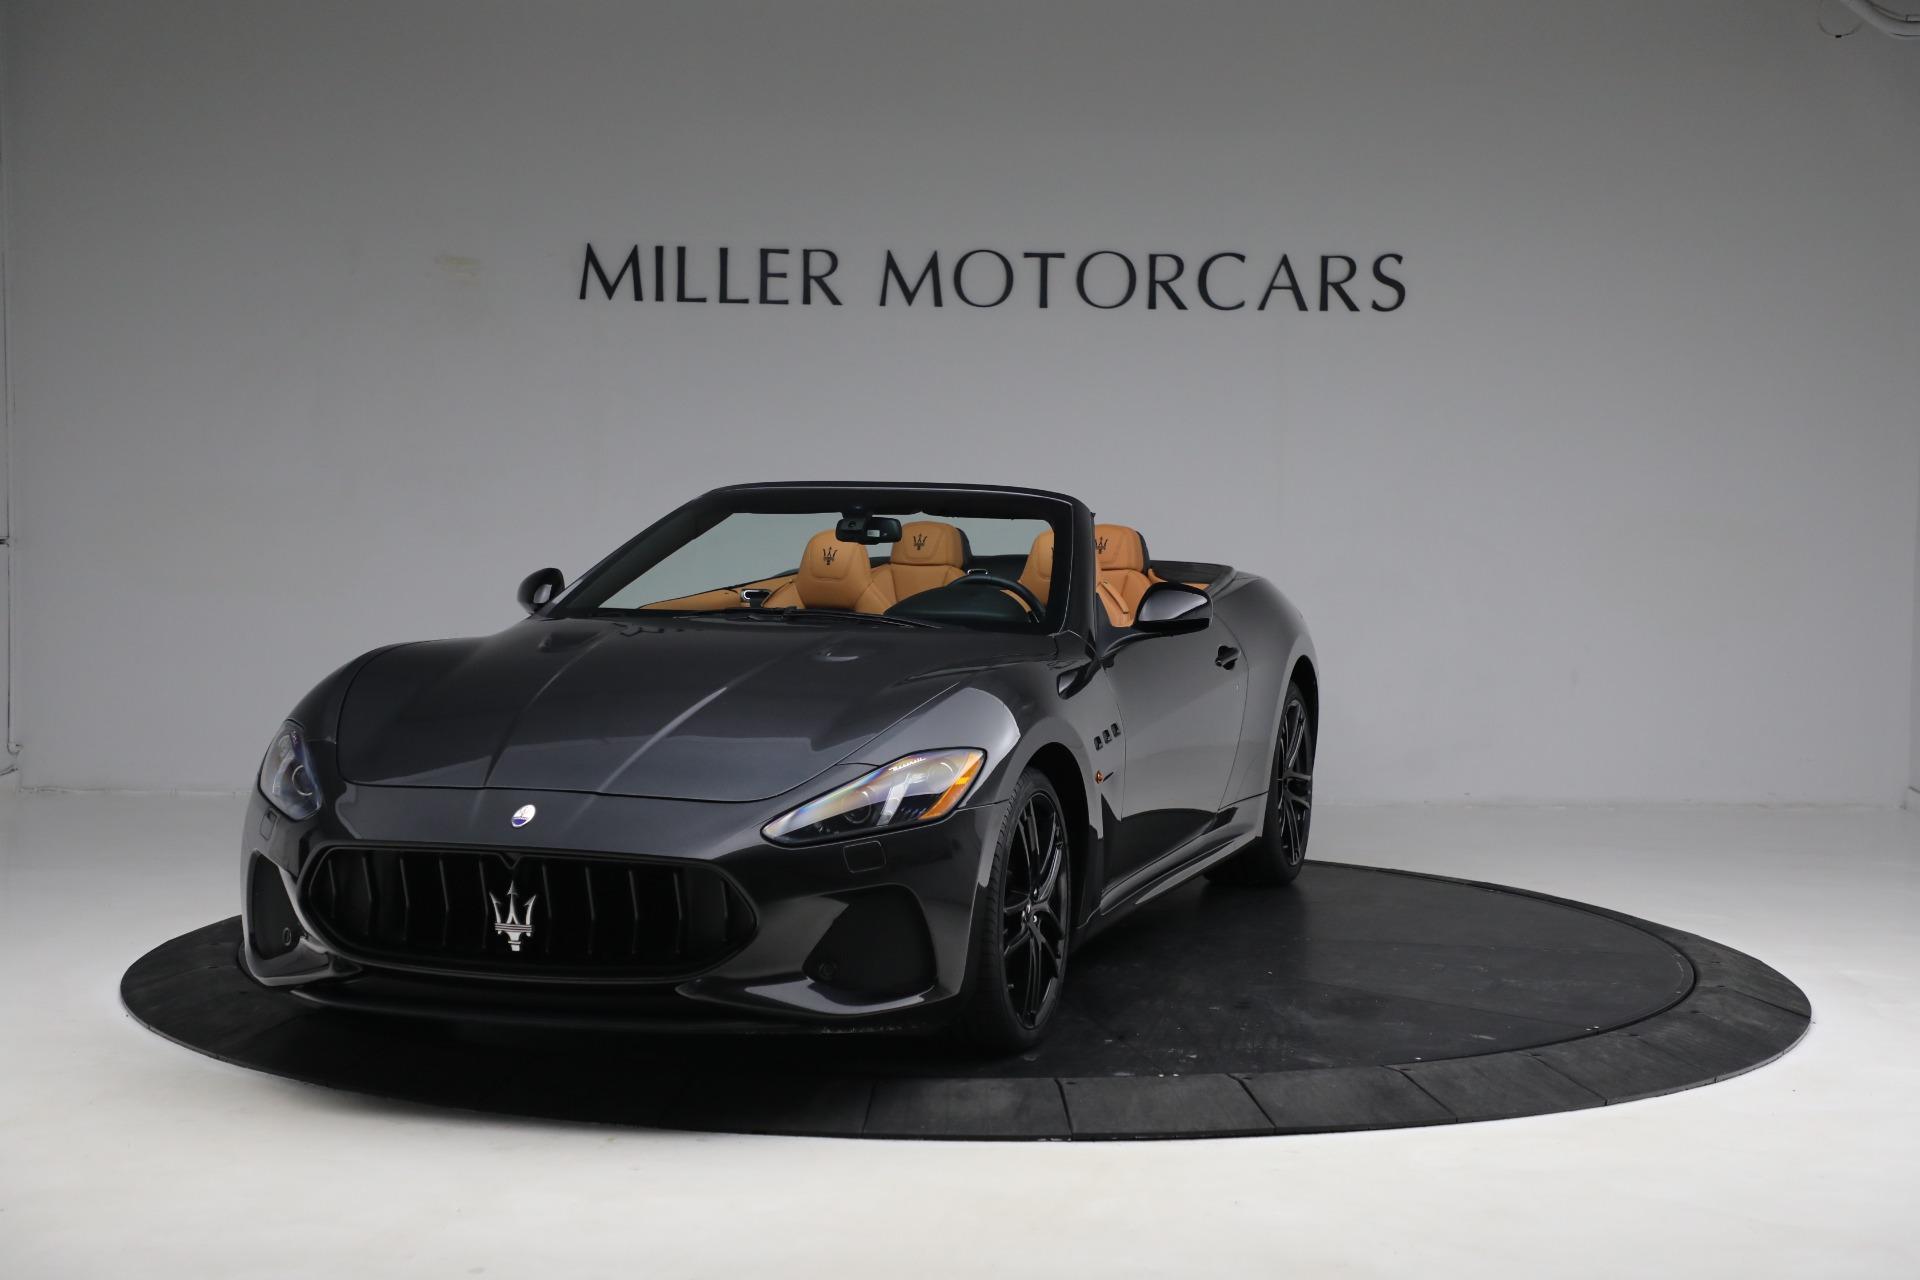 New 2019 Maserati GranTurismo MC Convertible For Sale In Westport, CT 3468_main